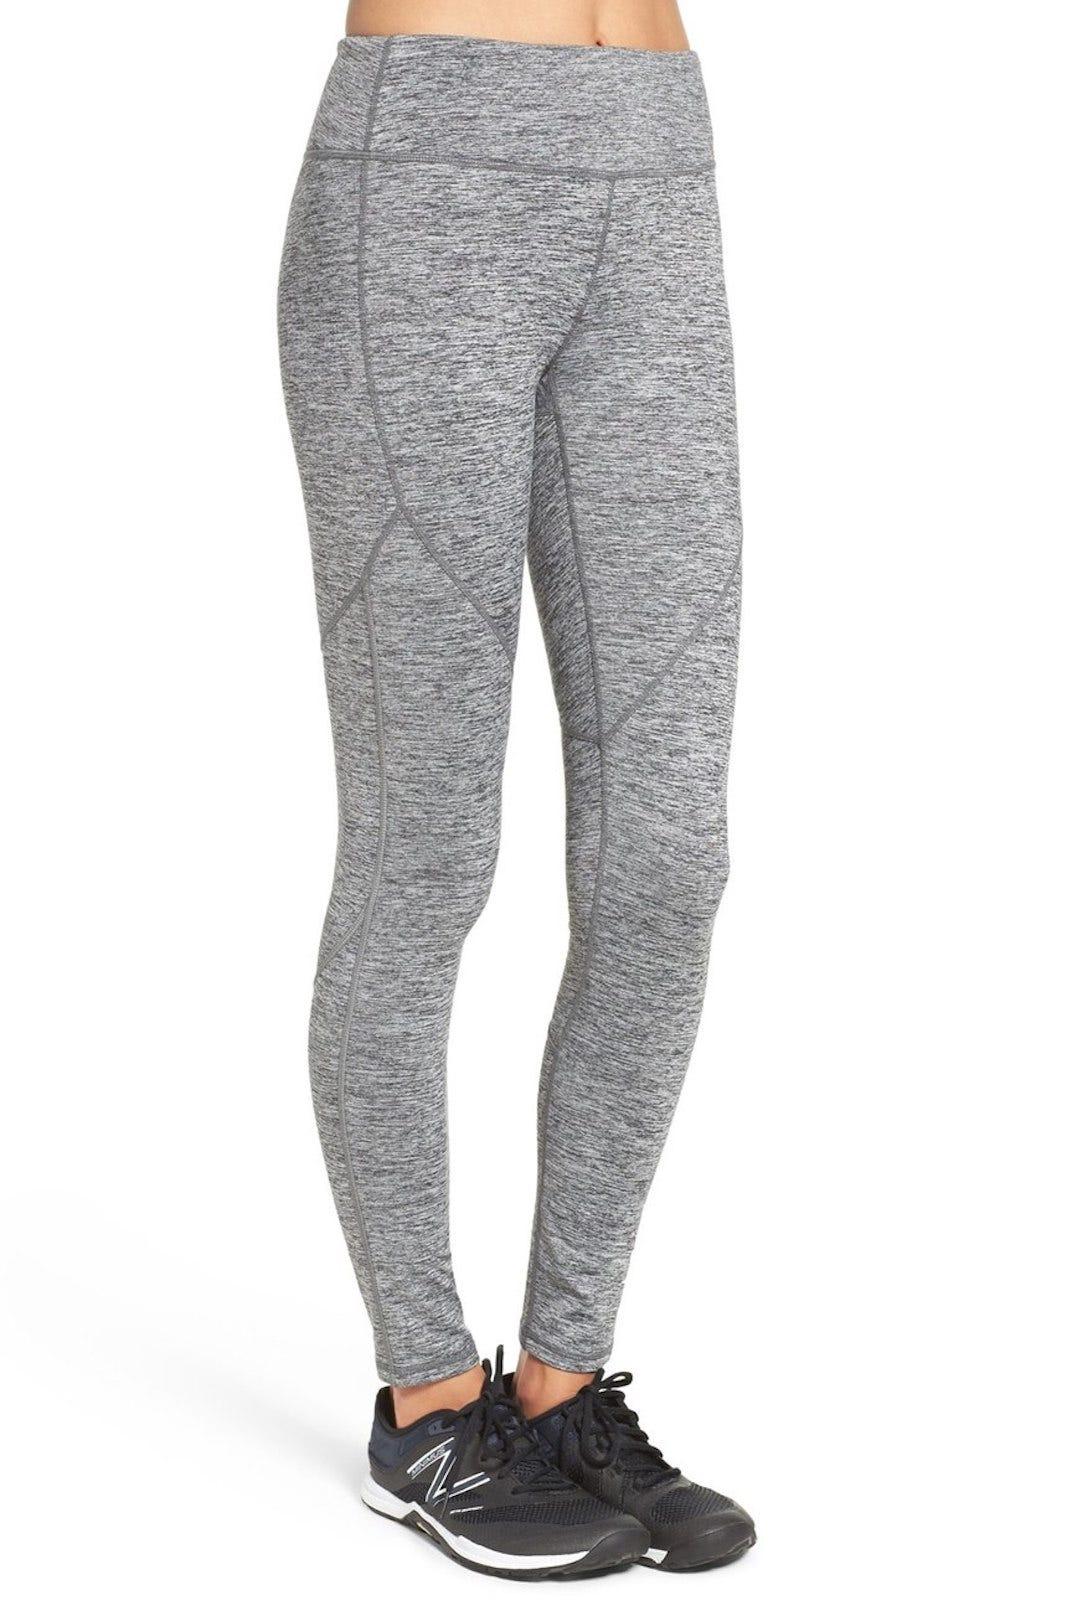 Best Reflective Clothing Winter Running Gear For Women Thermal Legging Tebal Zella Heat It Up Leggings